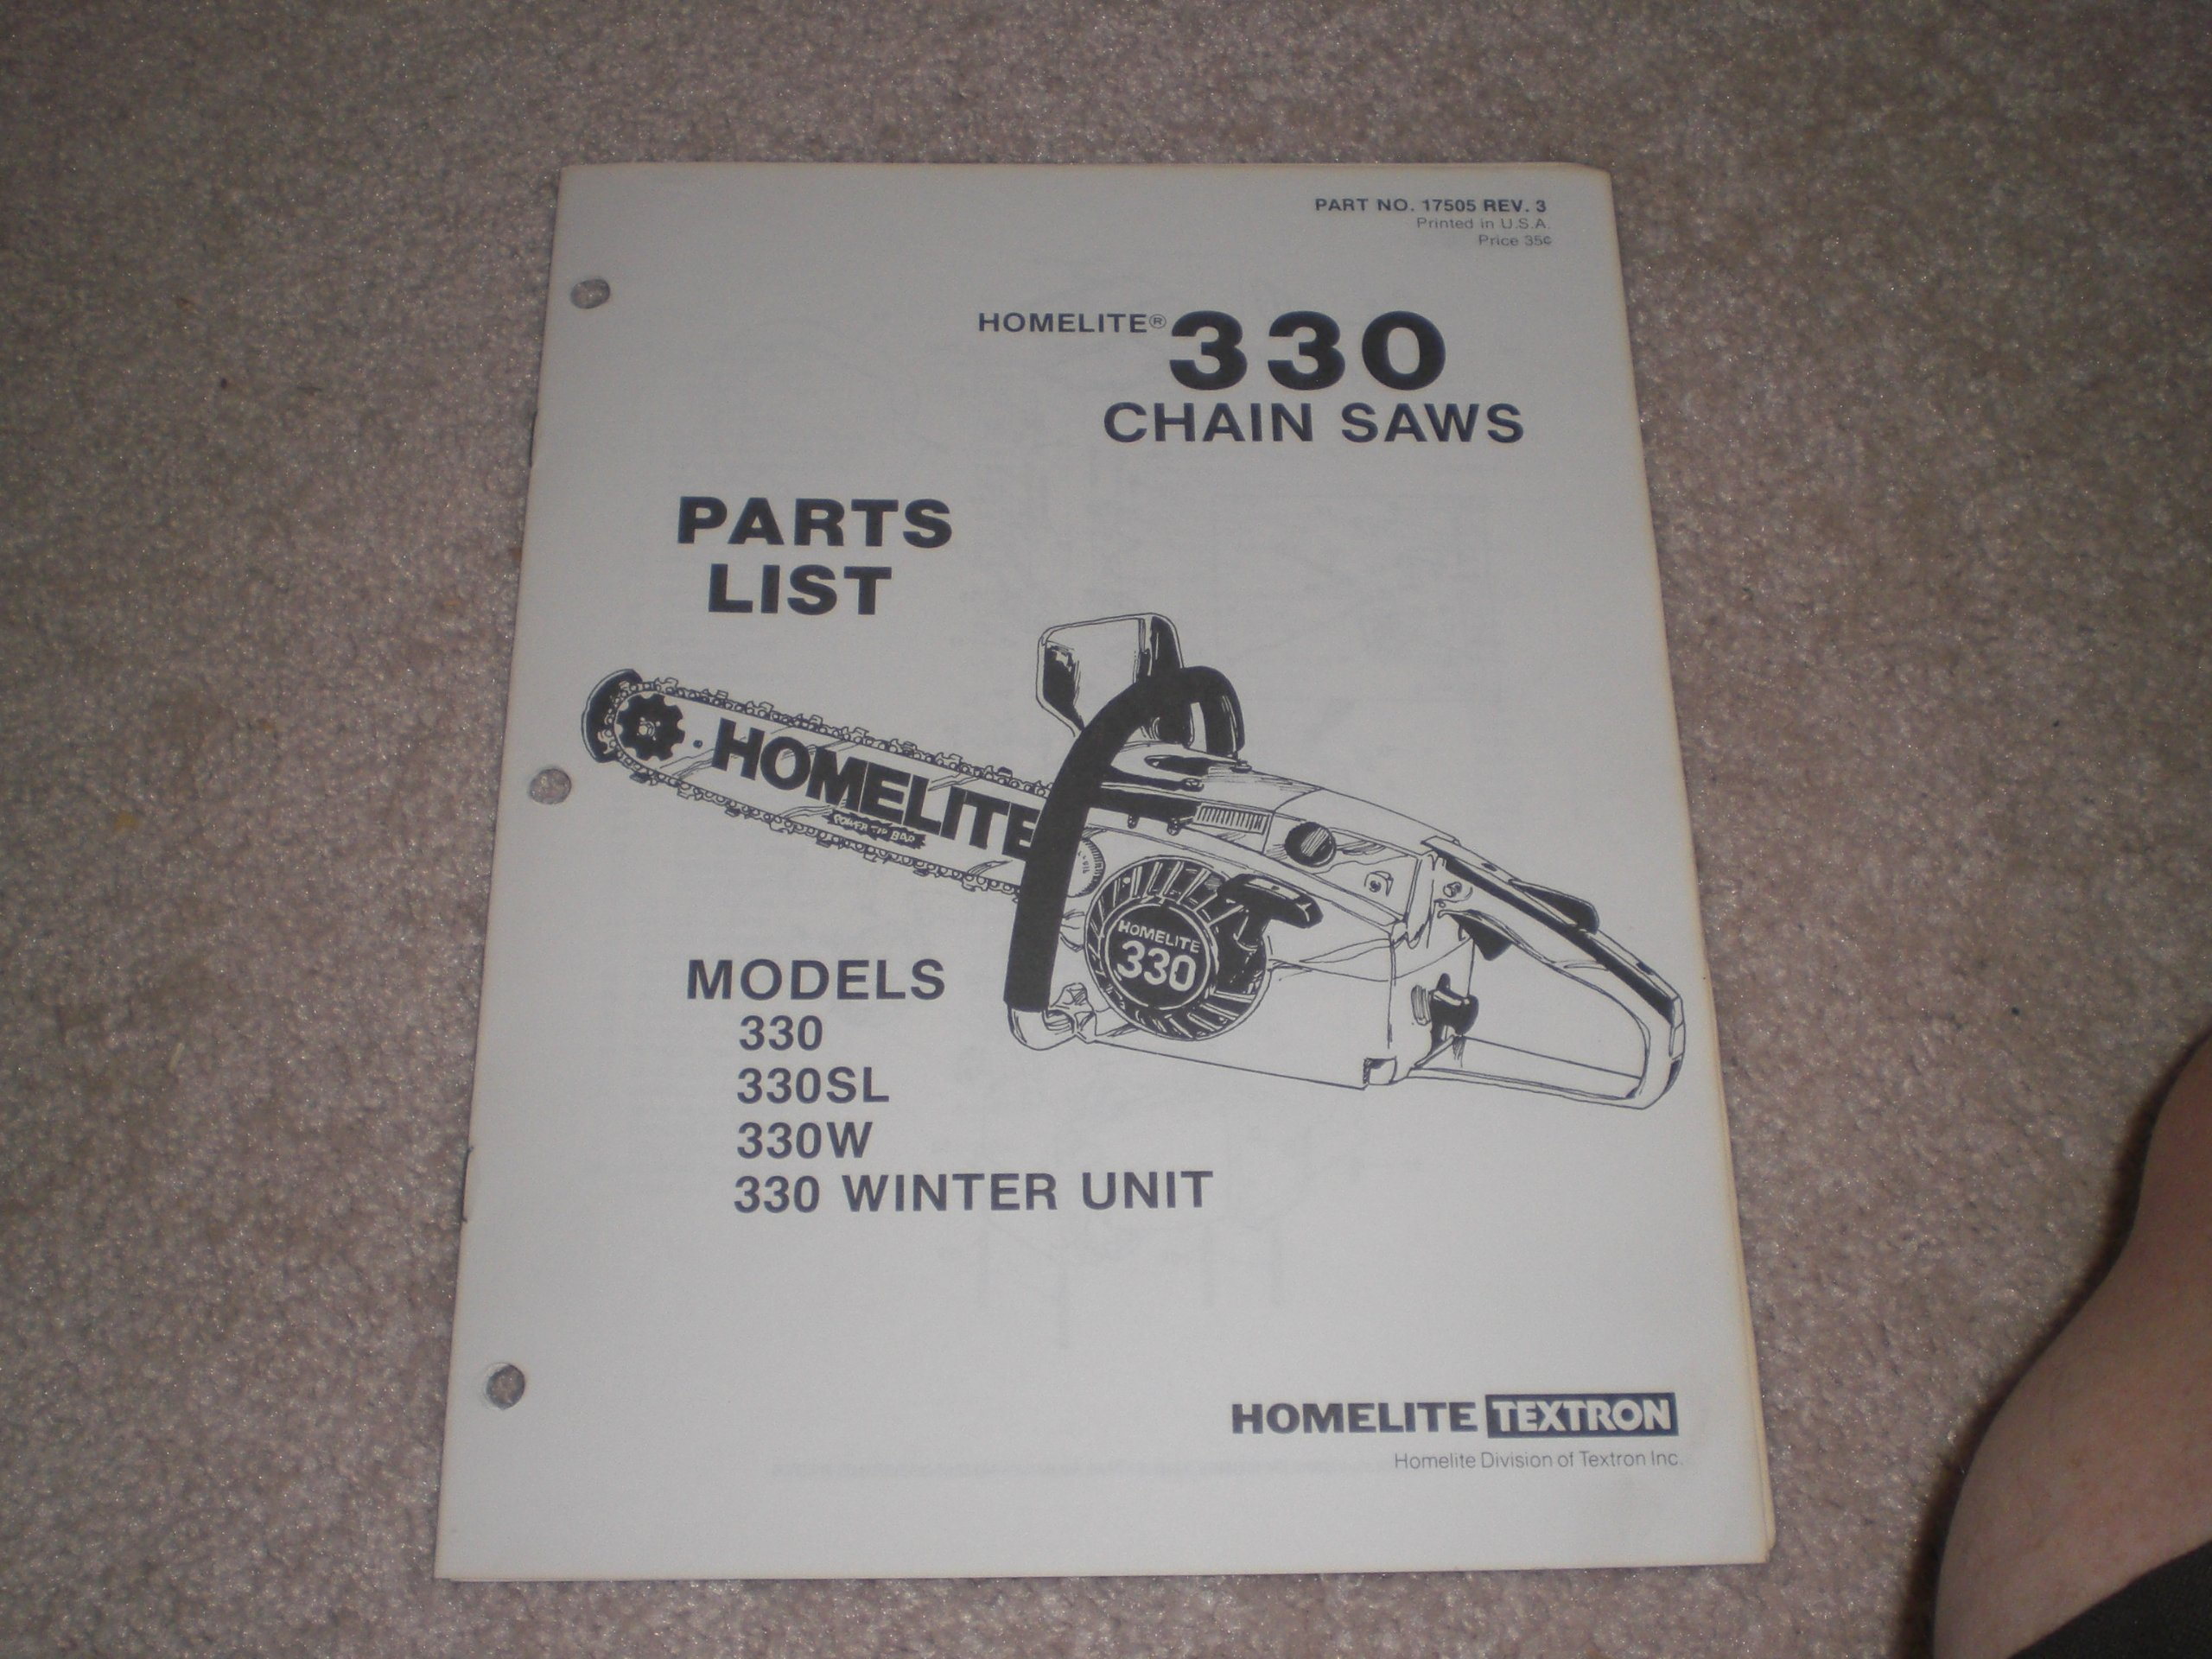 Homelite 330 Chain Saws Parts List Illustrated: homelite